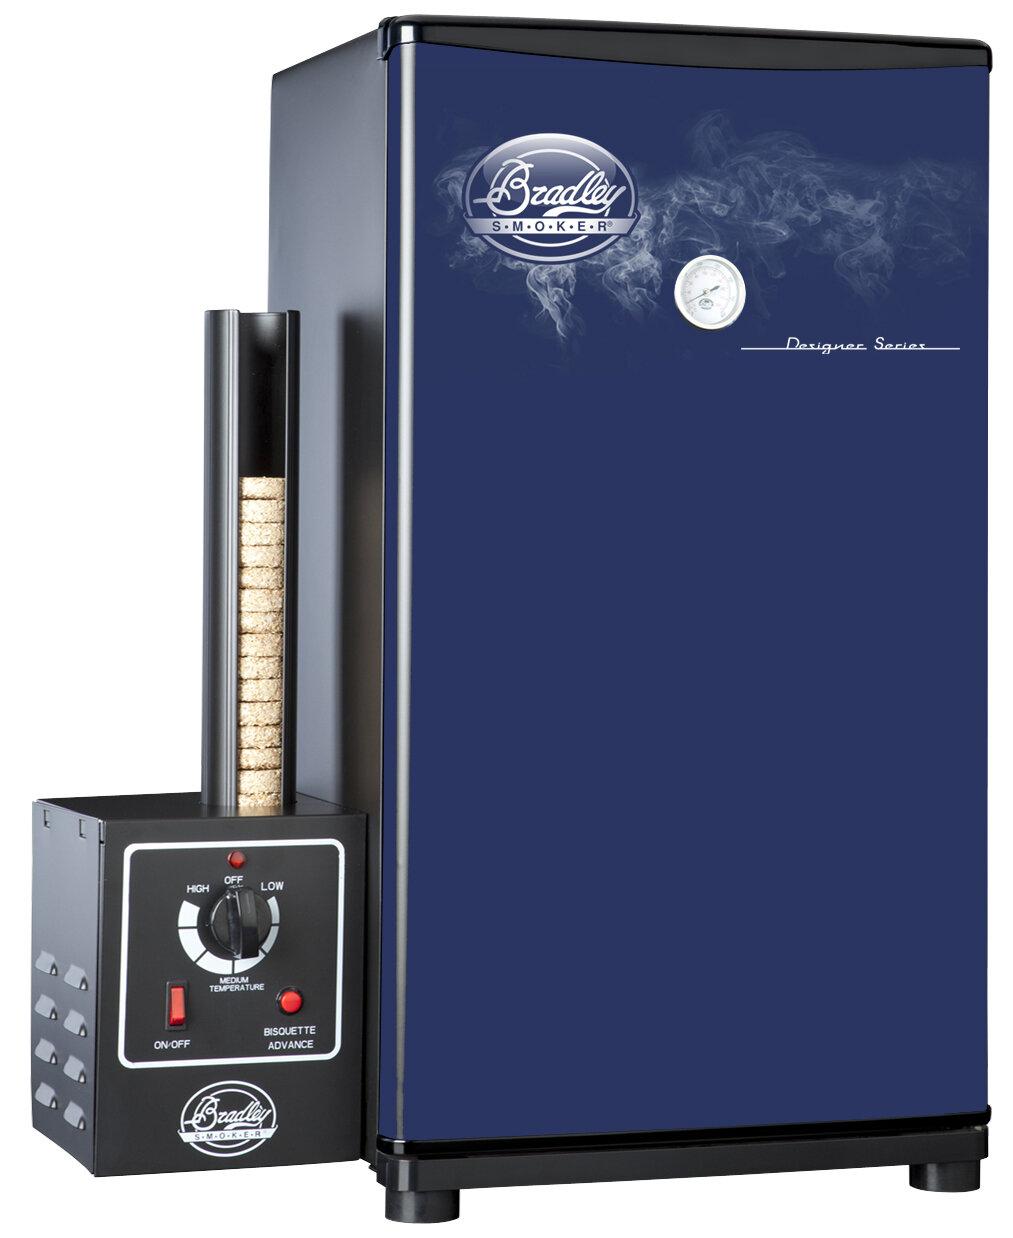 Bradley Smoker Electric Smoker Ebay